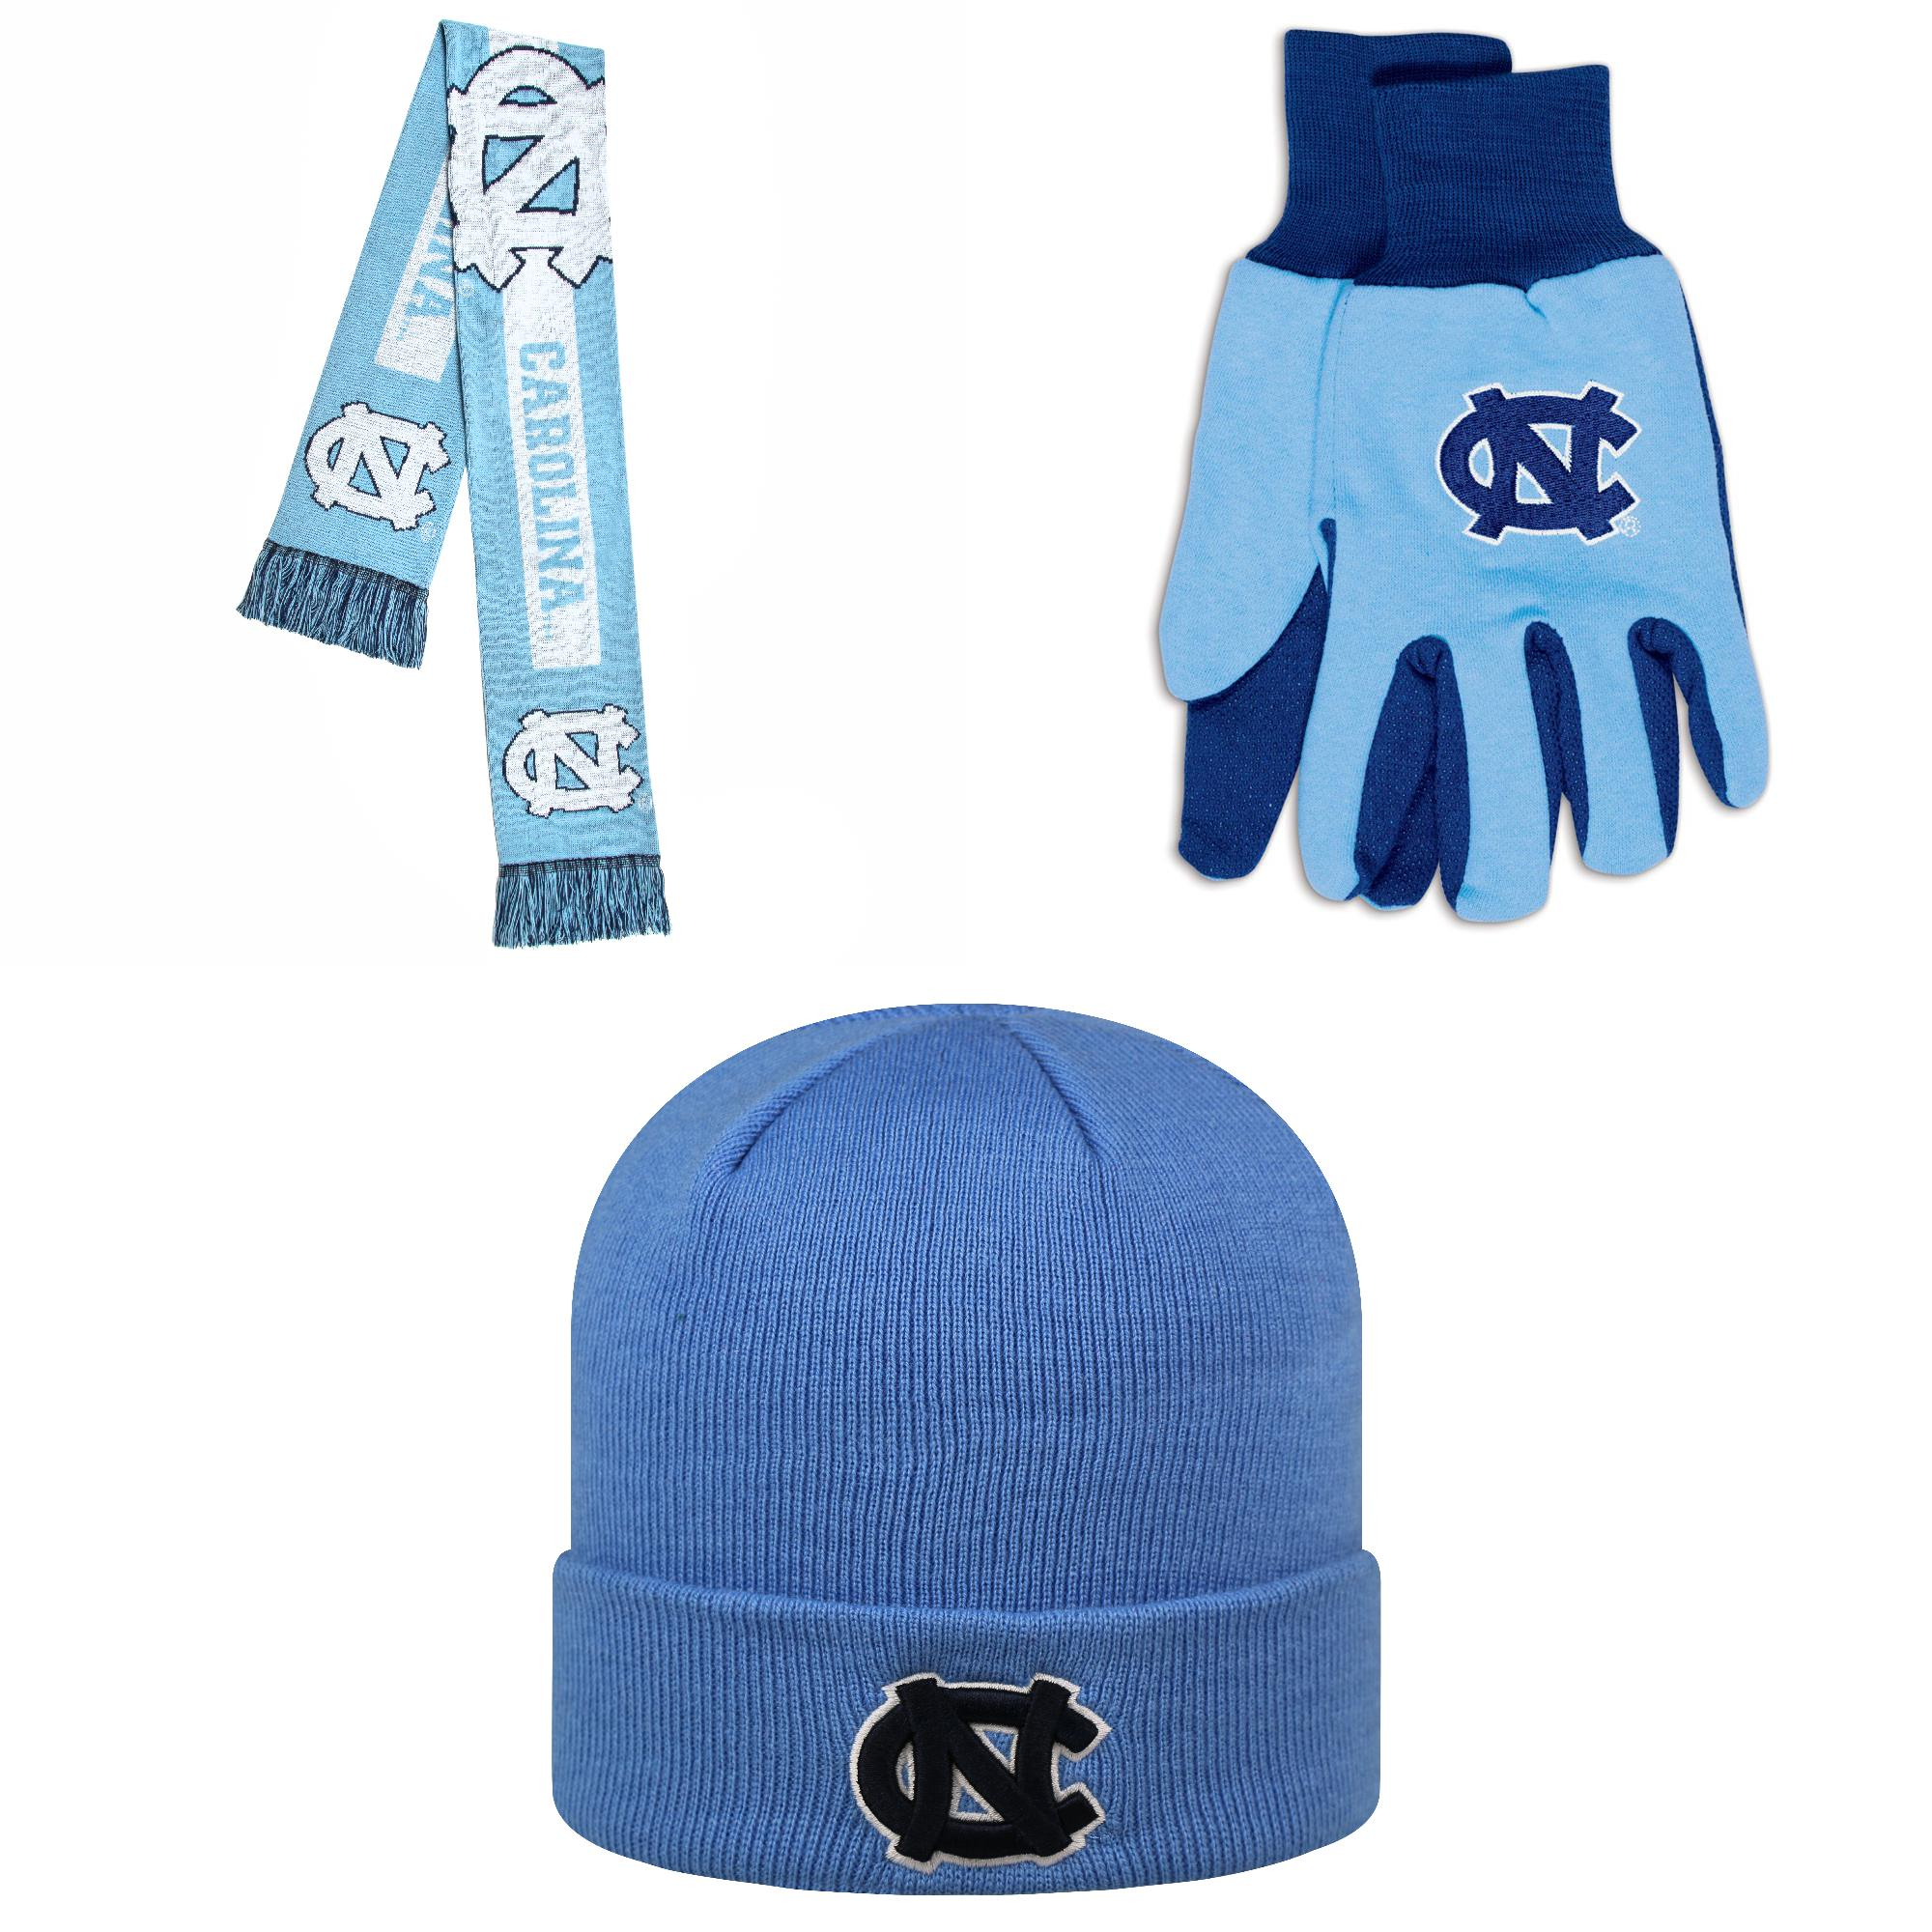 NCAA  Grip Work Glove TOW Beanie Hat And Big Logo Scarf 3 Pack Bundle